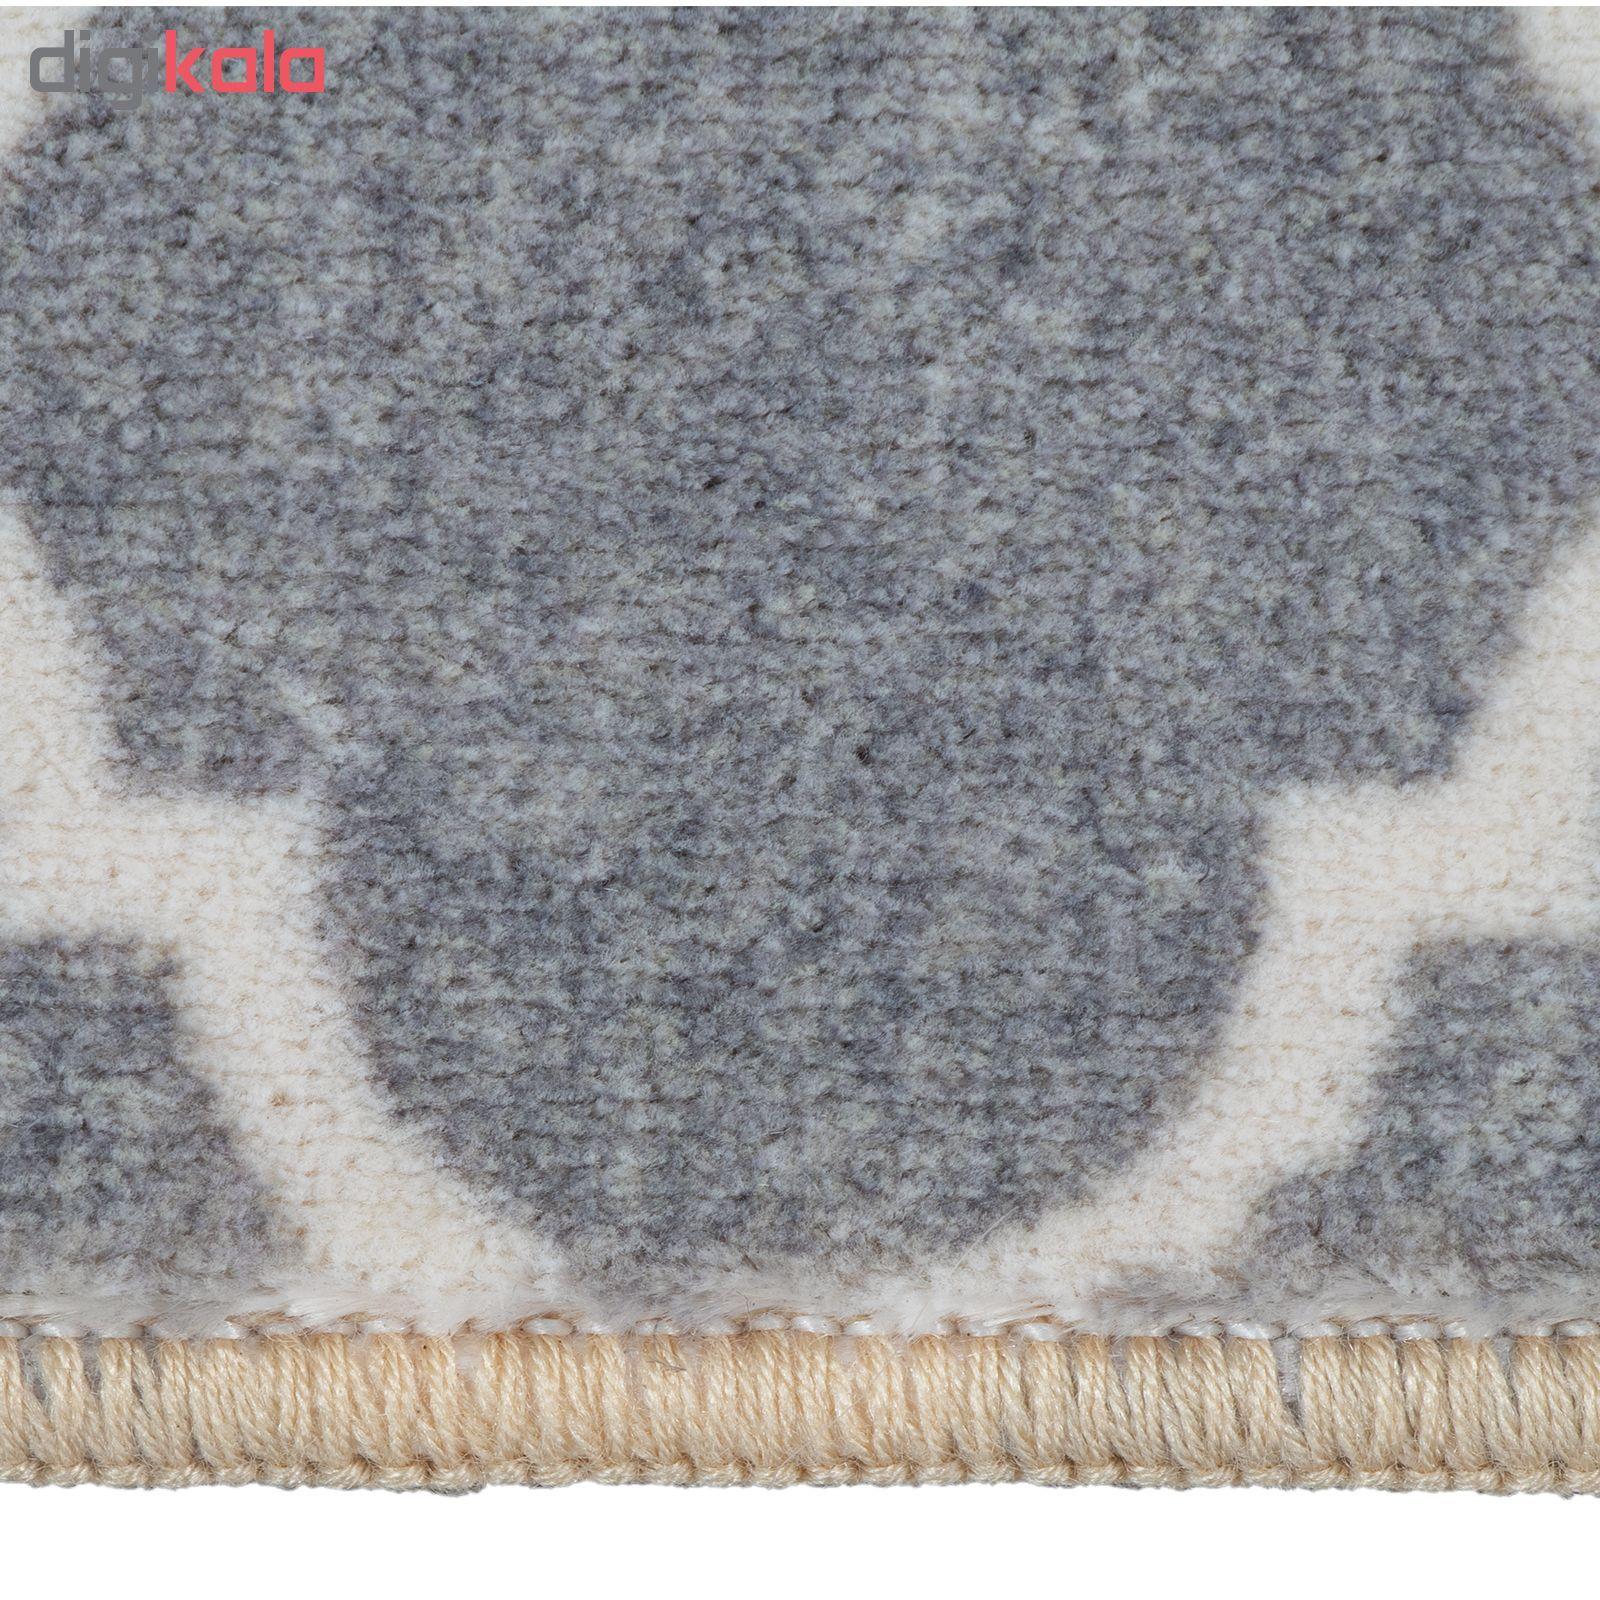 فرش ماشینی محتشم کد 100450 زمینه طوسی main 1 5